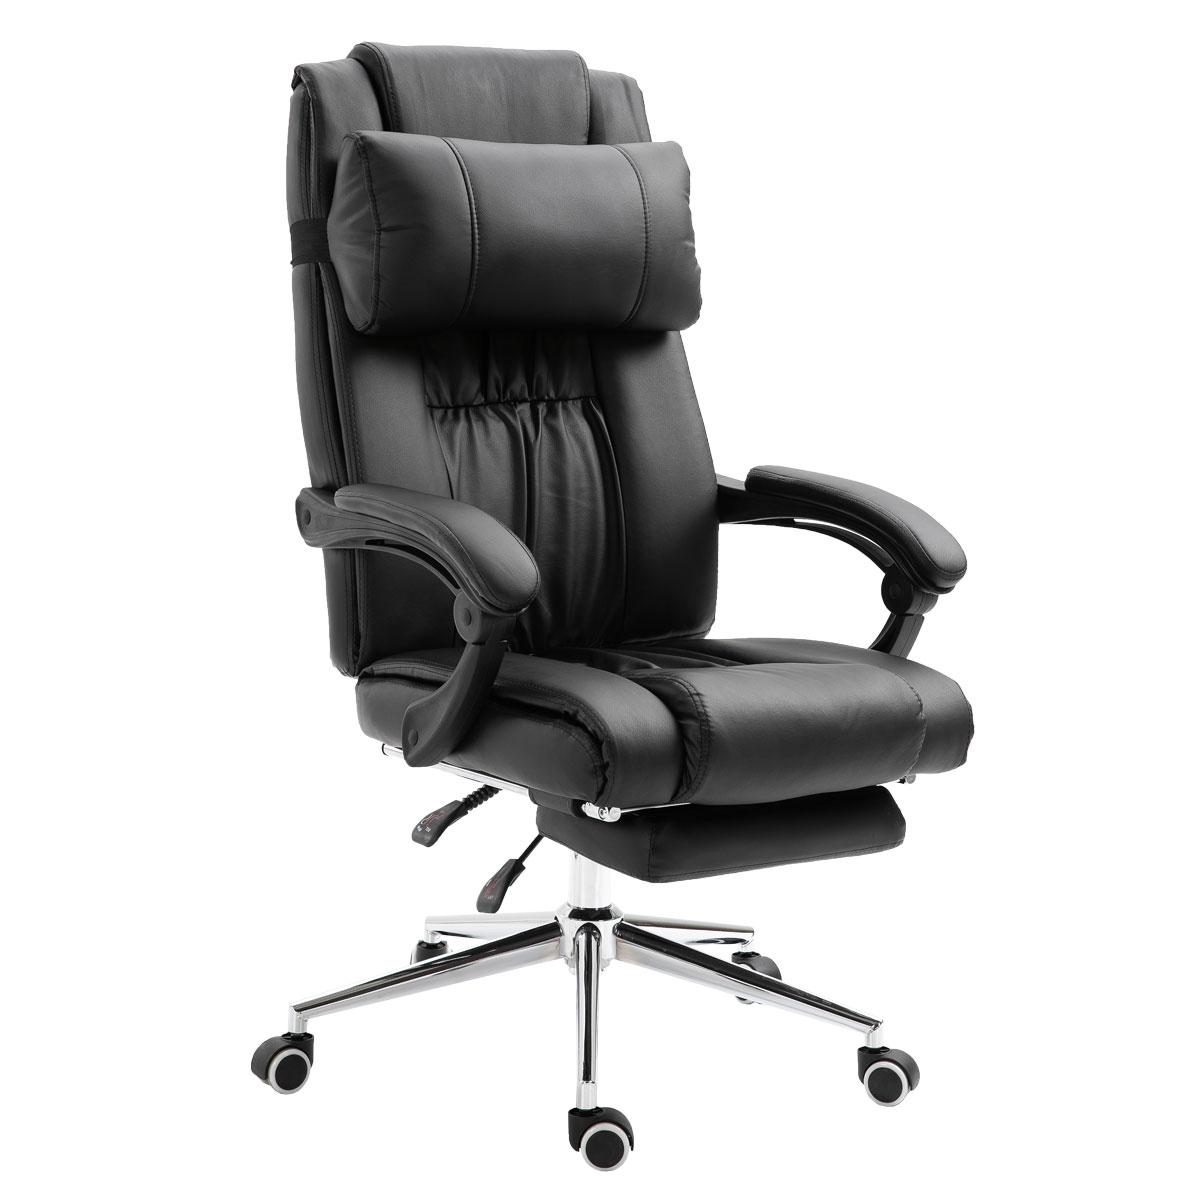 90468 SVITA Bürostuhl ausfahrbar schwarz